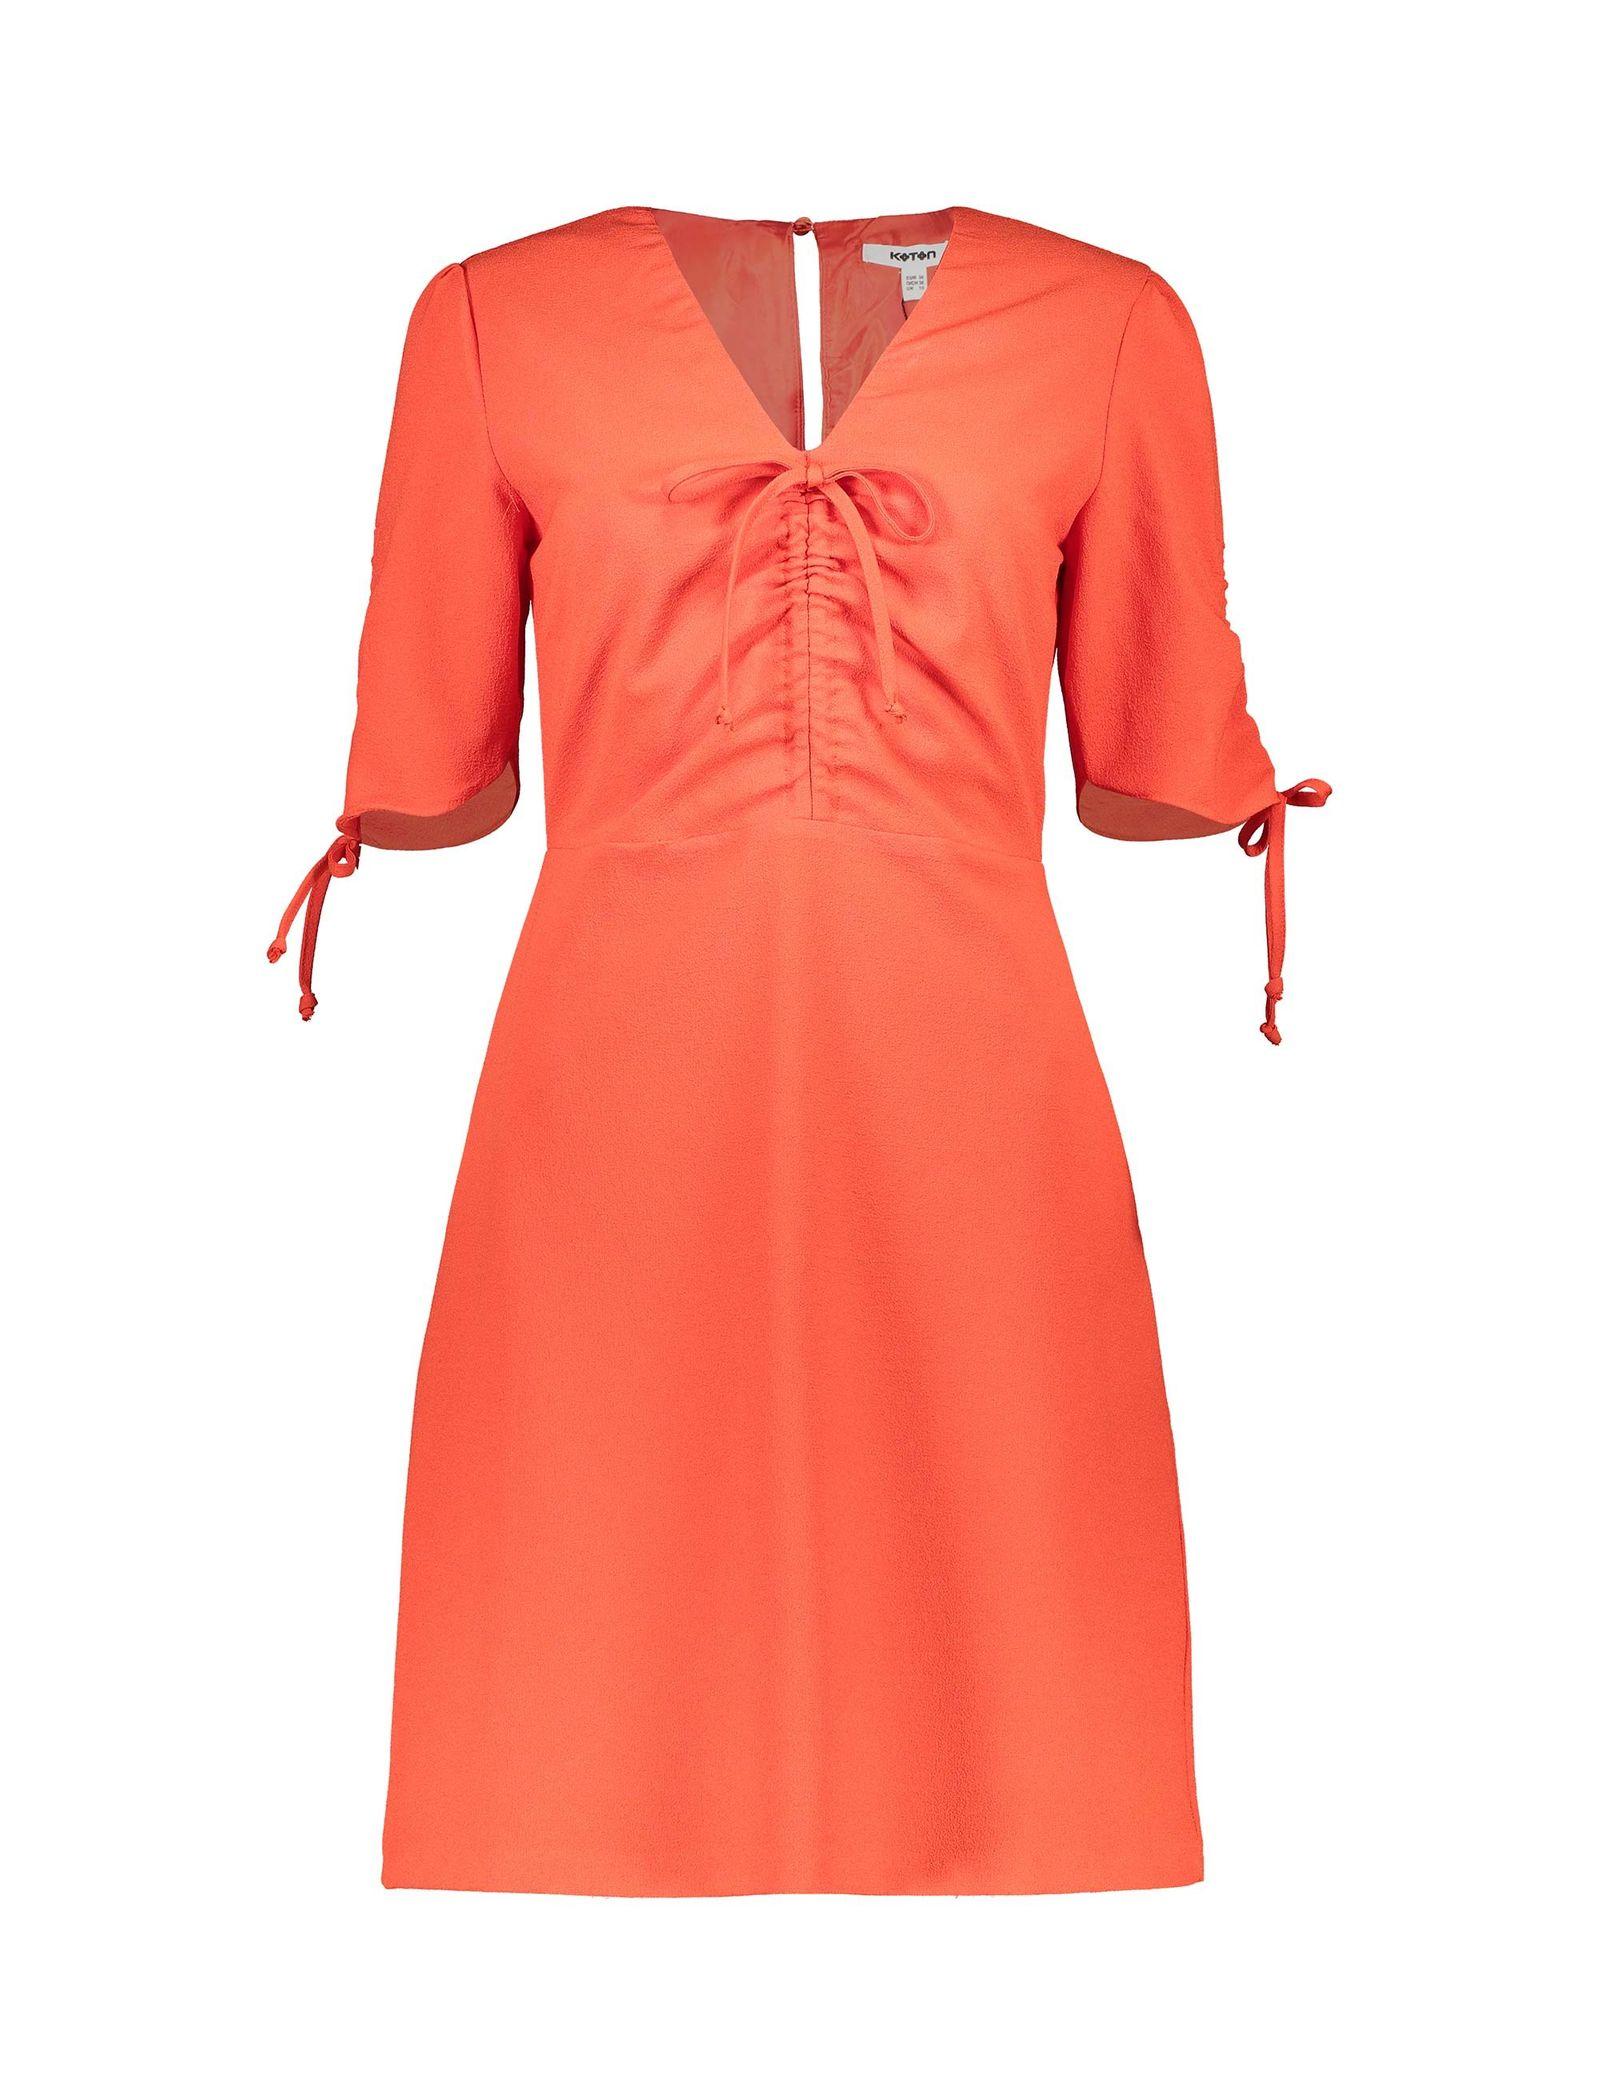 پیراهن کوتاه زنانه - کوتون - قرمز - 1